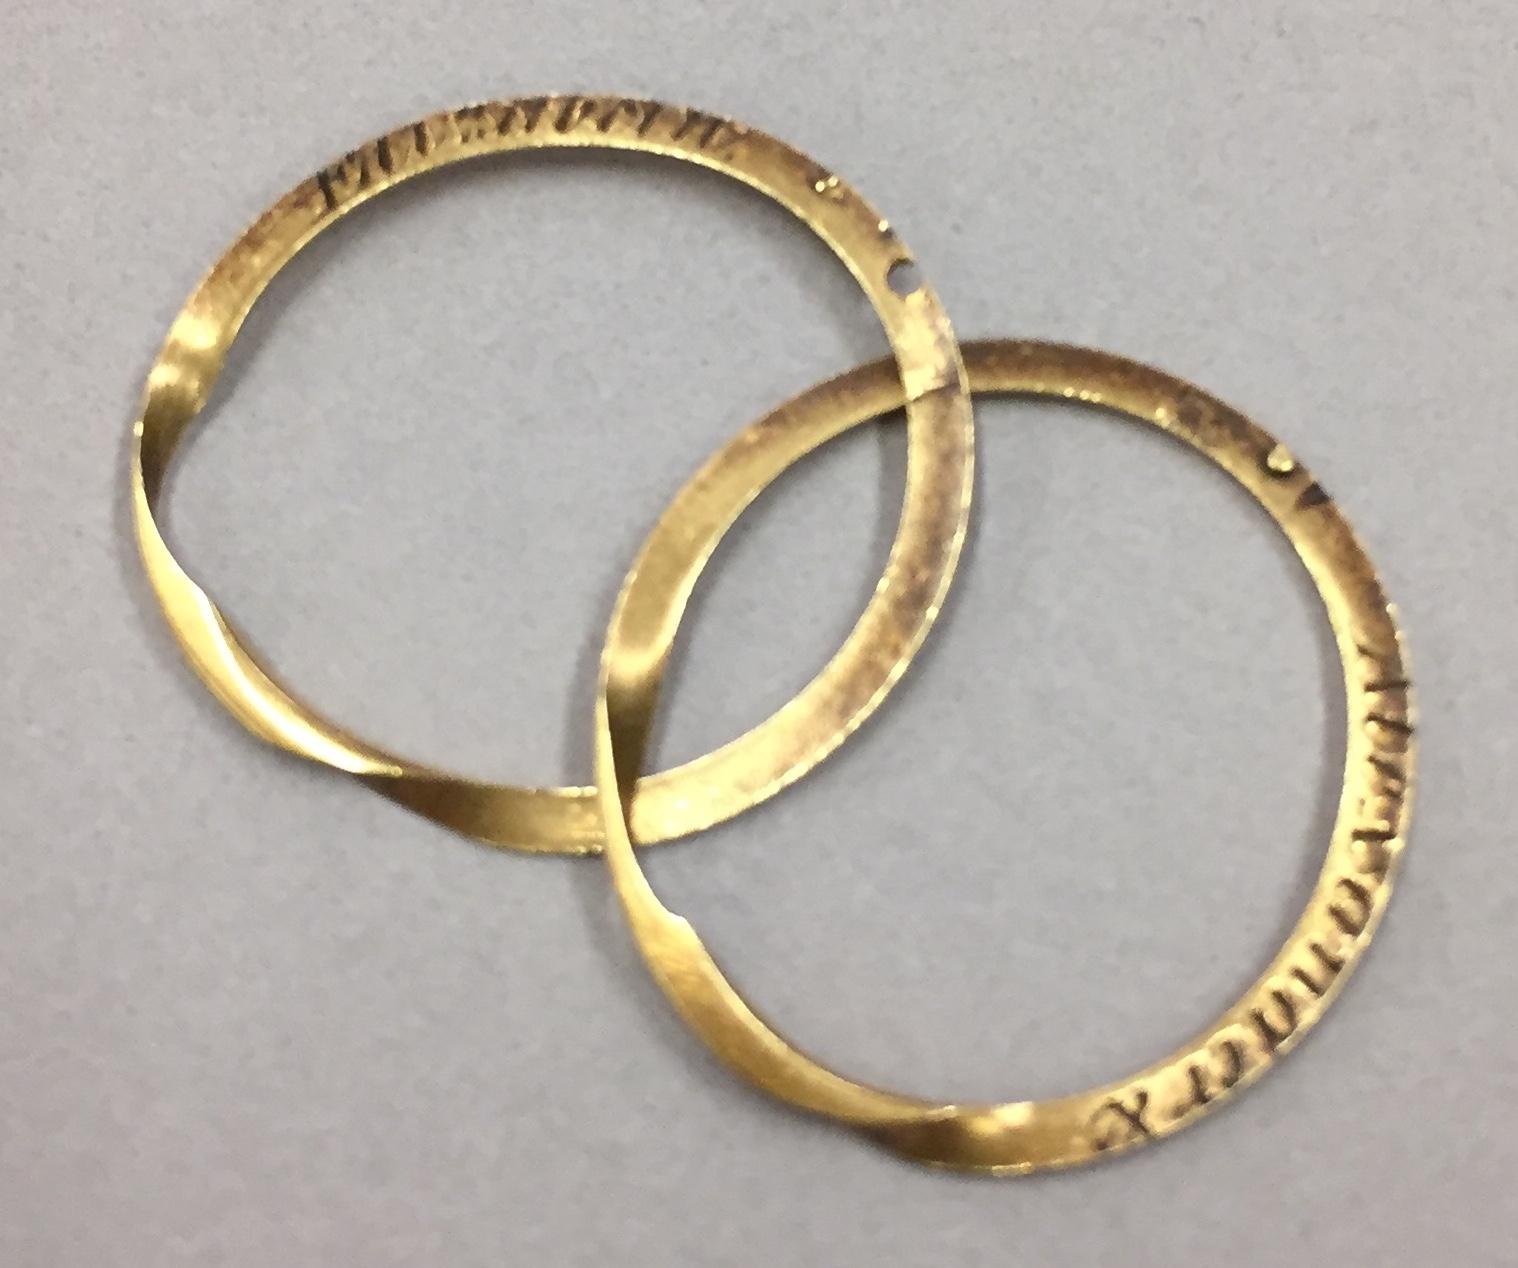 Two Nerdy History Girls The Wedding Ring that Alexander Hamilton